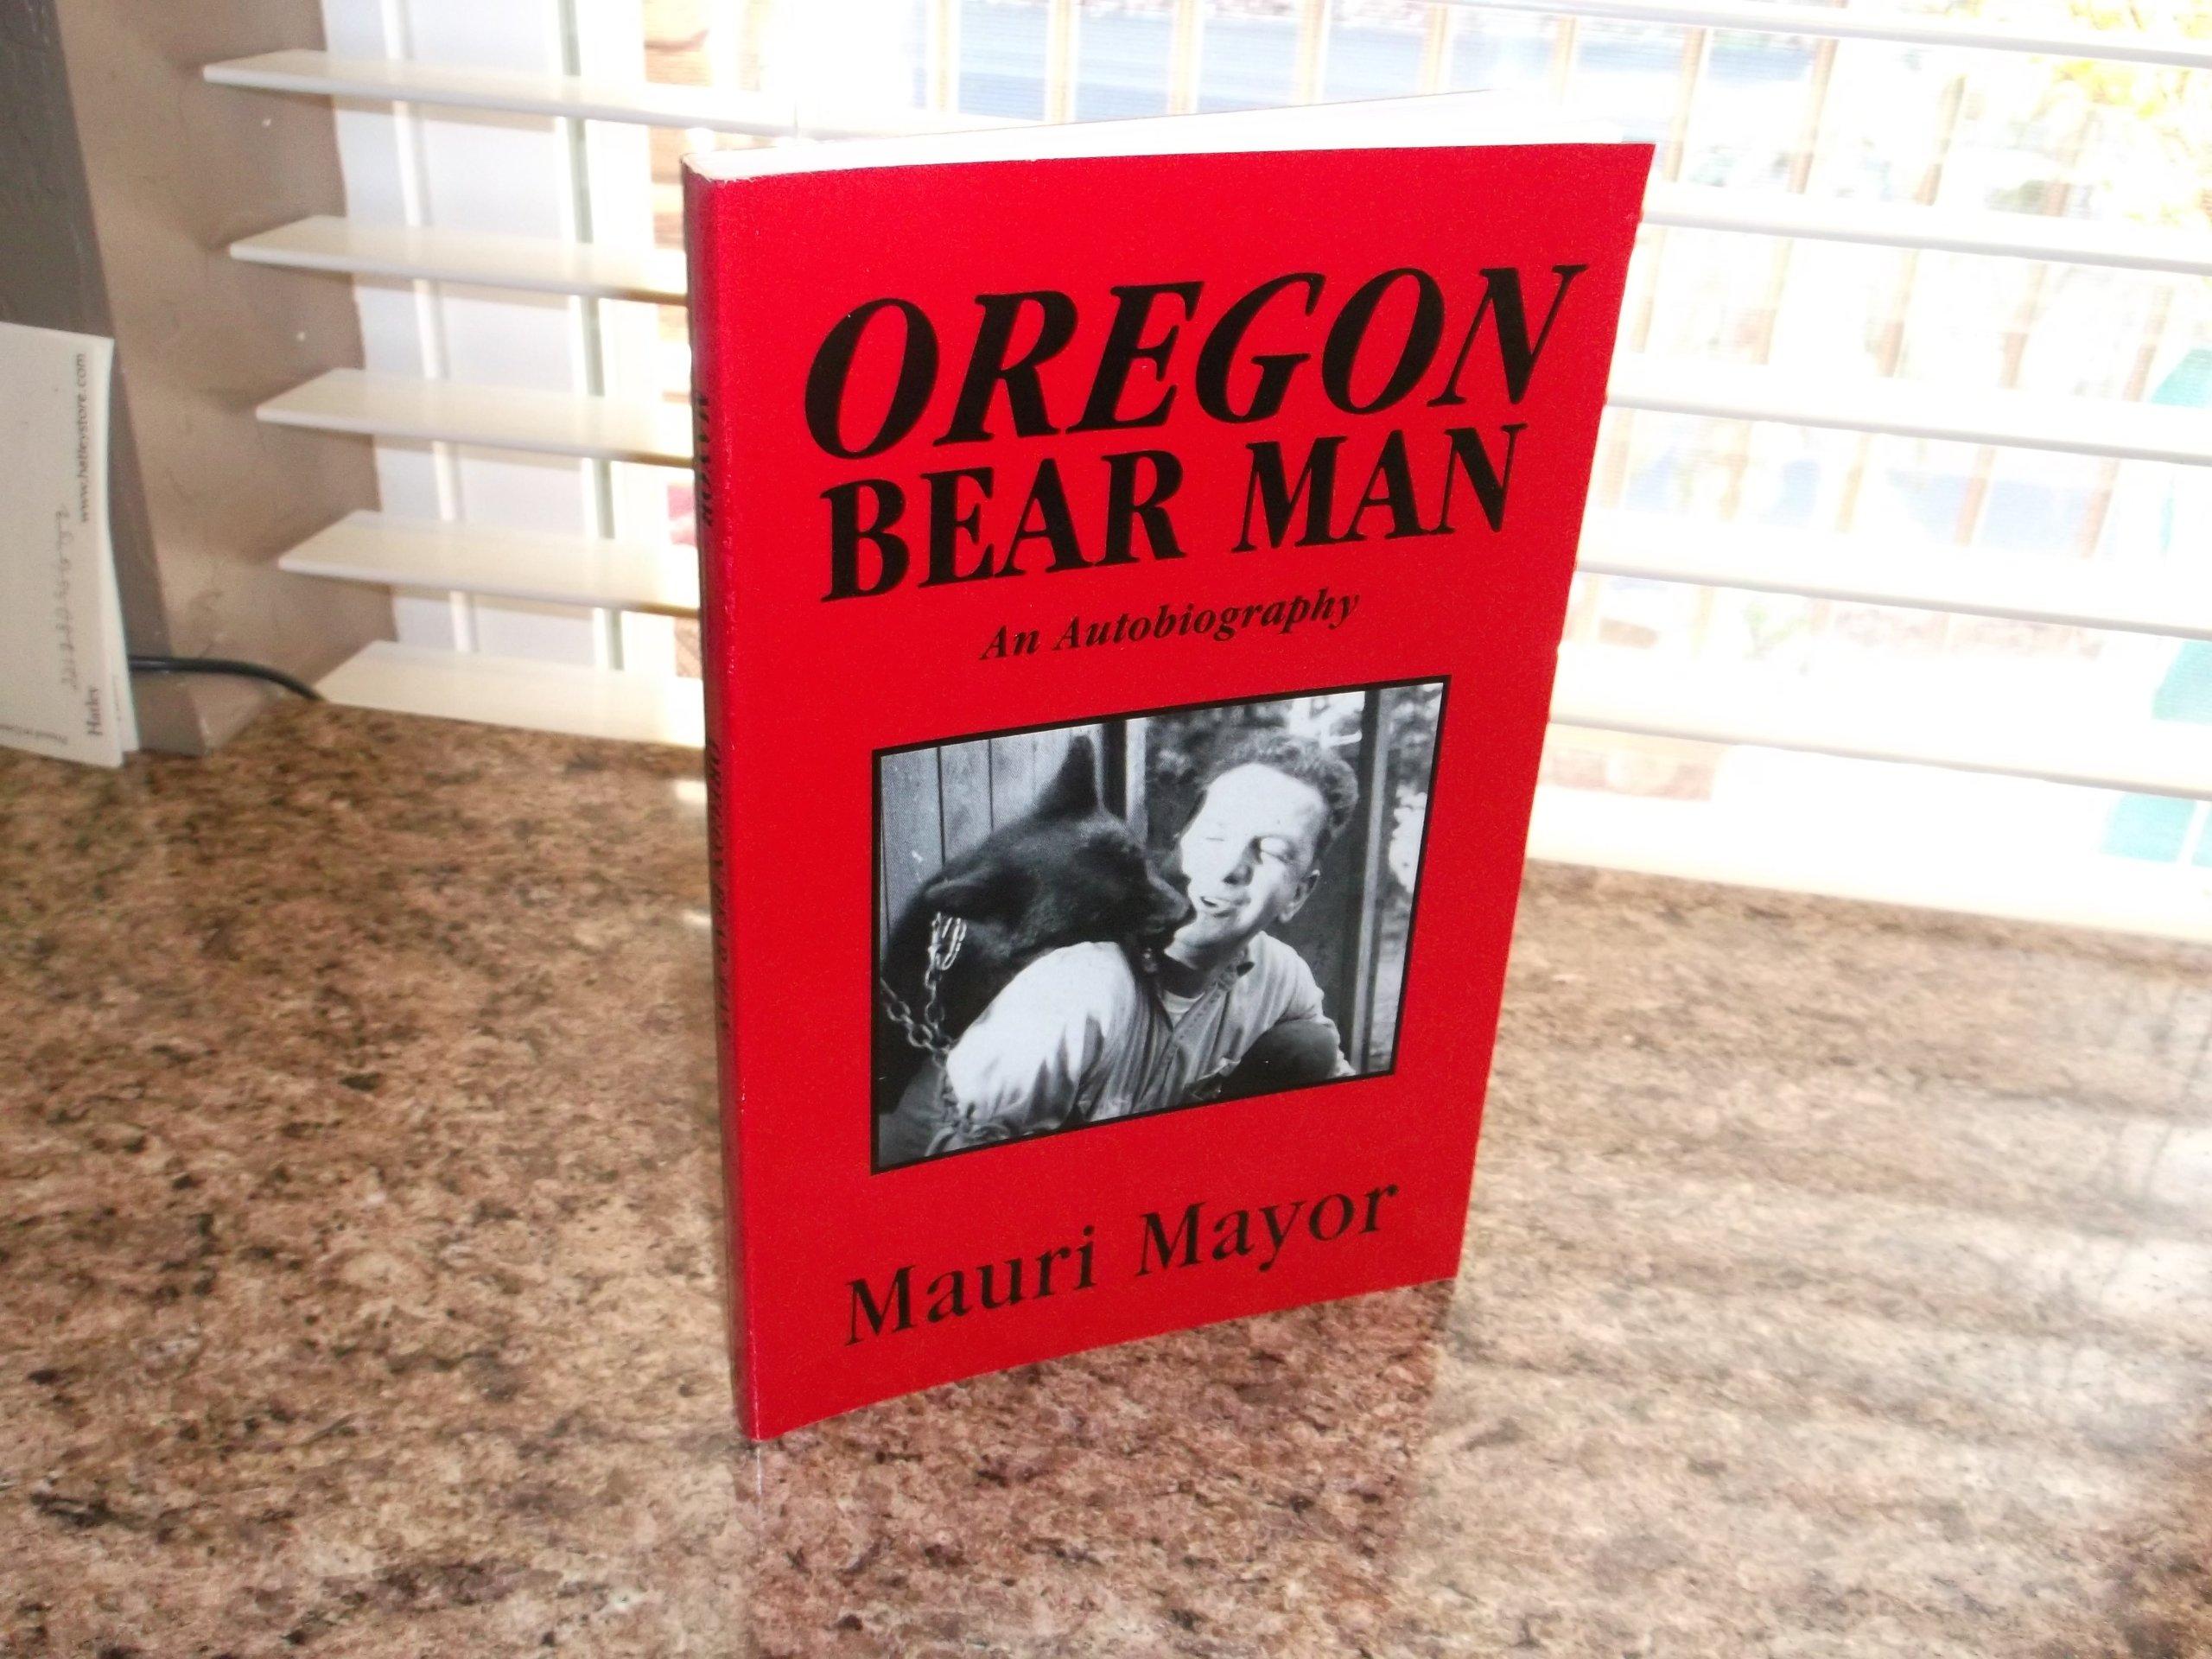 Oregon bear man, Mayor, Mauri